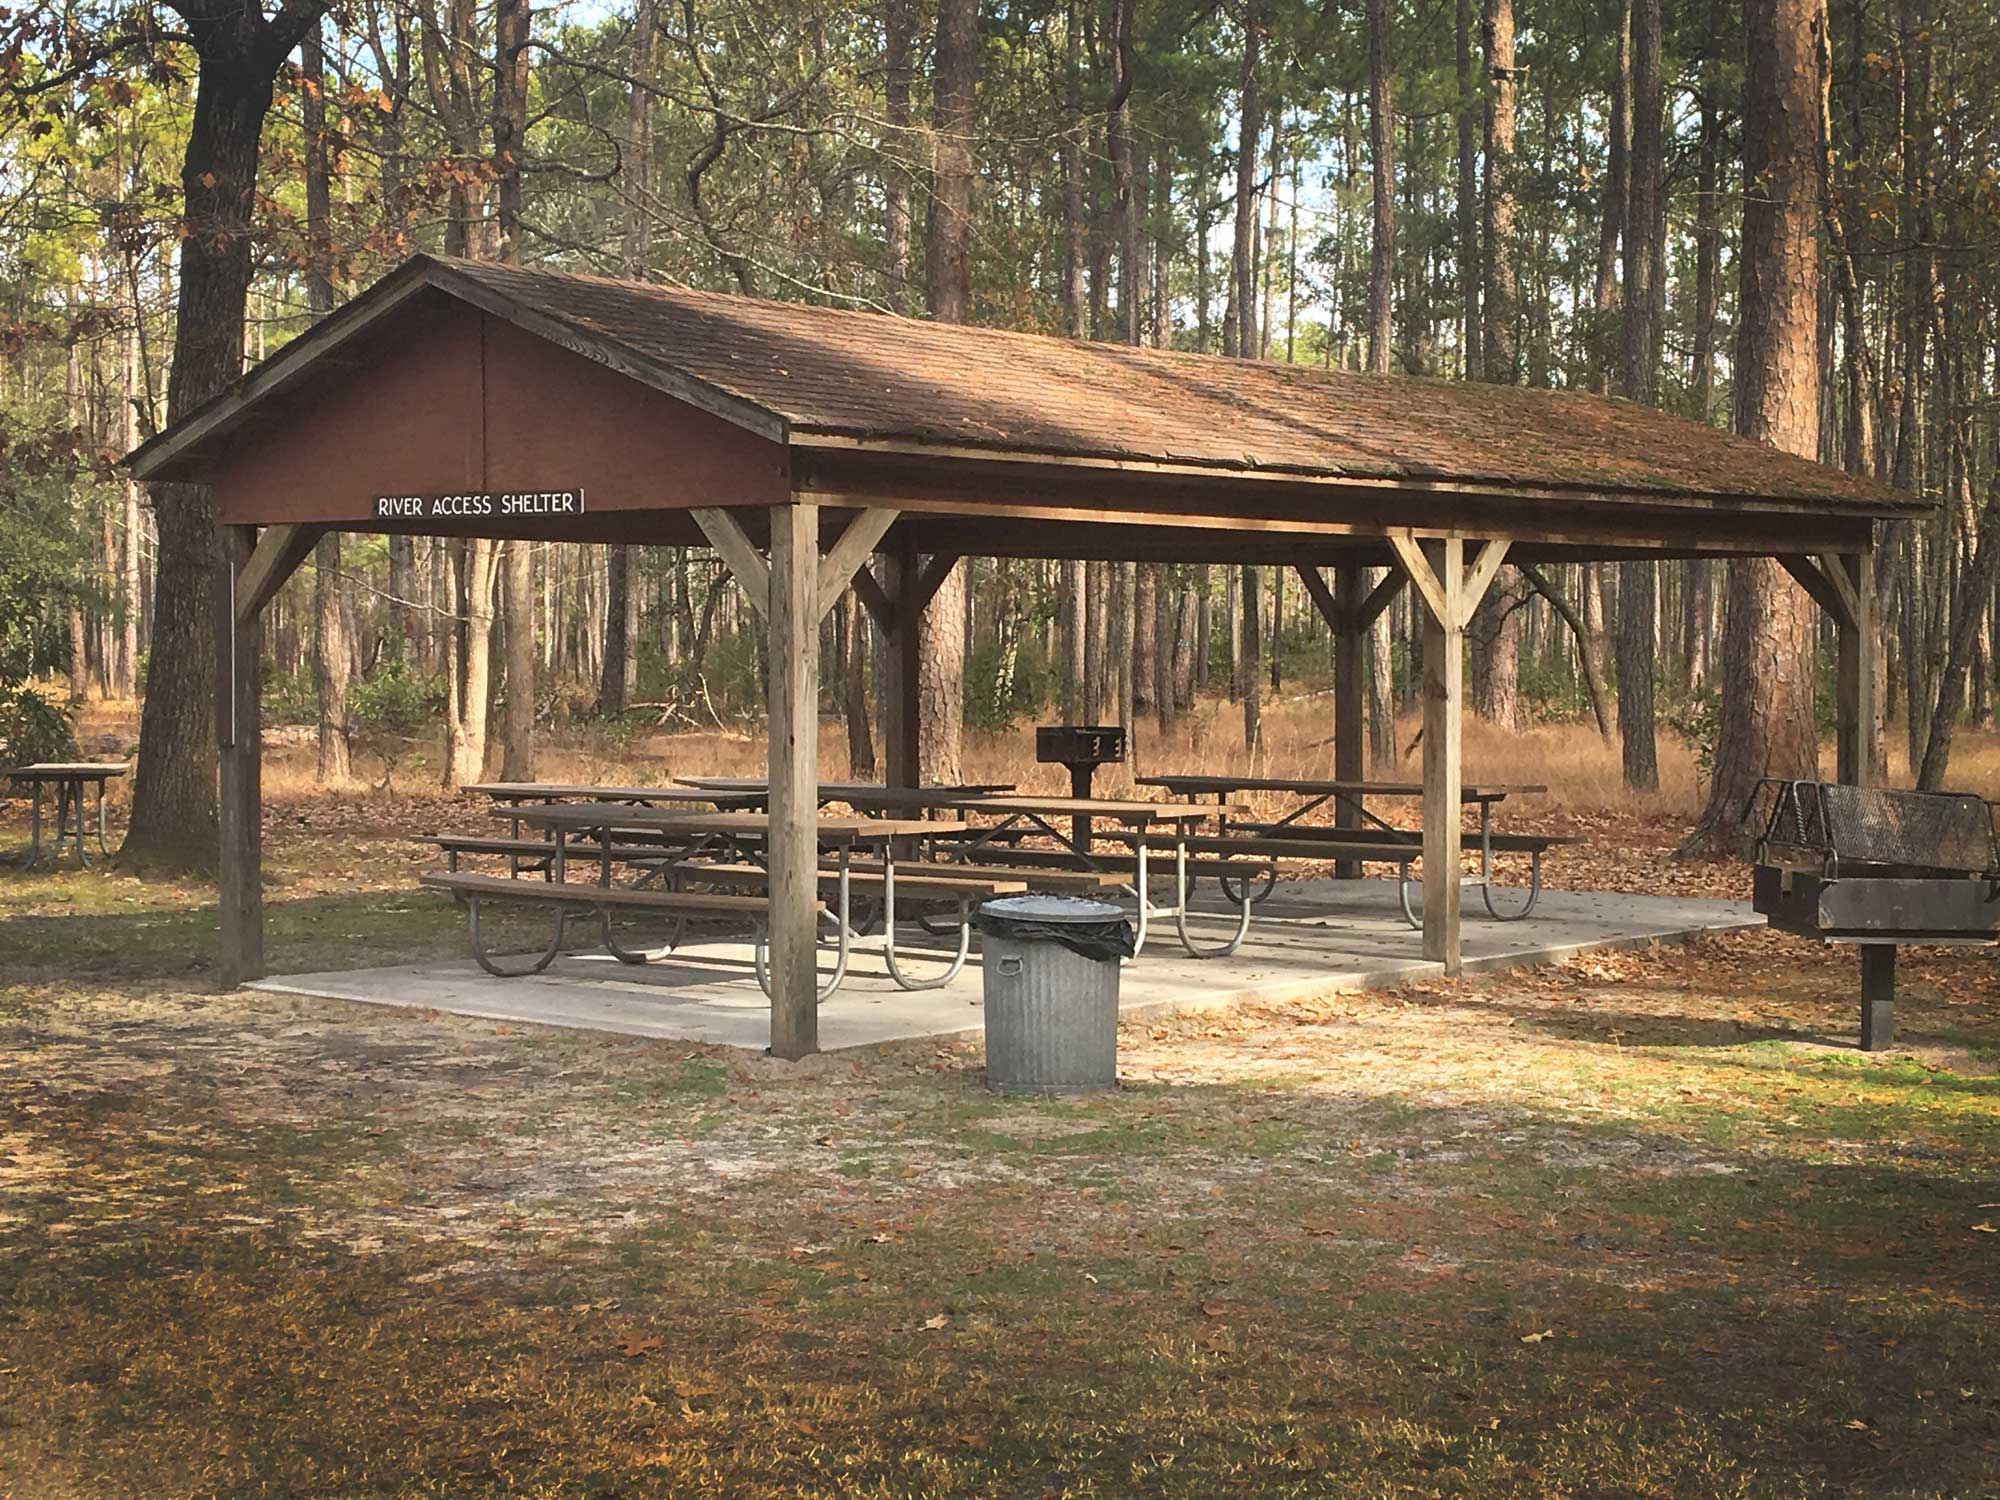 River Access Shelter at Goose Creek State Park, North Carolina